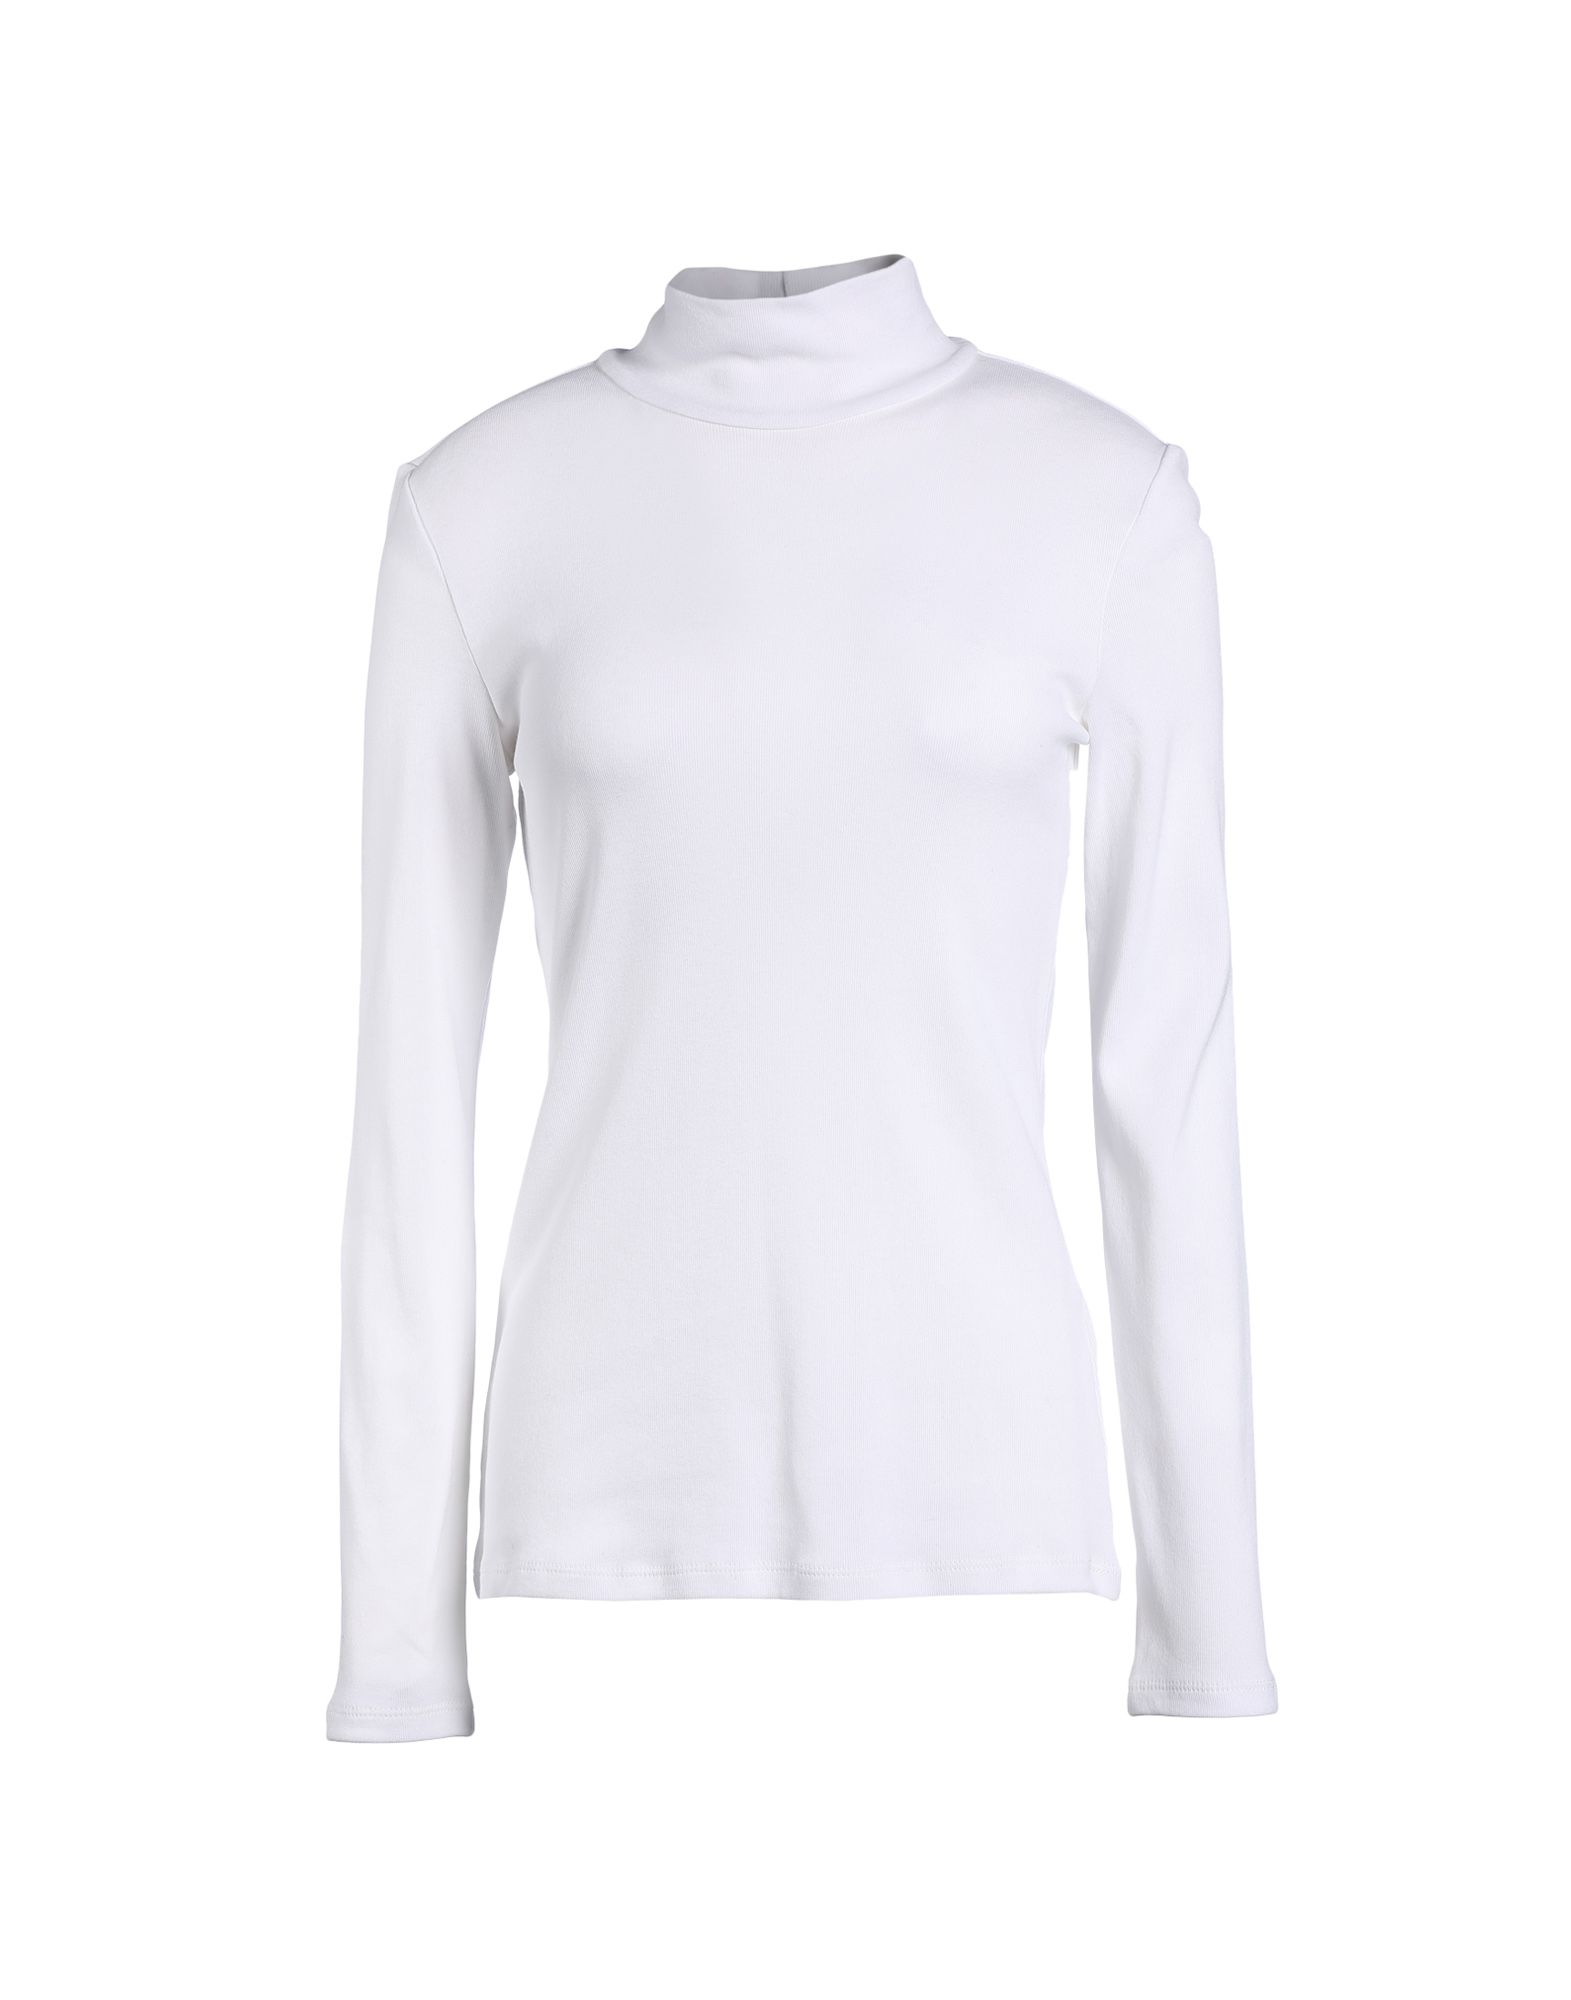 Honig Charles Tyrwhitt Red And White Check Non Iron Single Cuff Cotton Shirt Size M Shirts & Tops